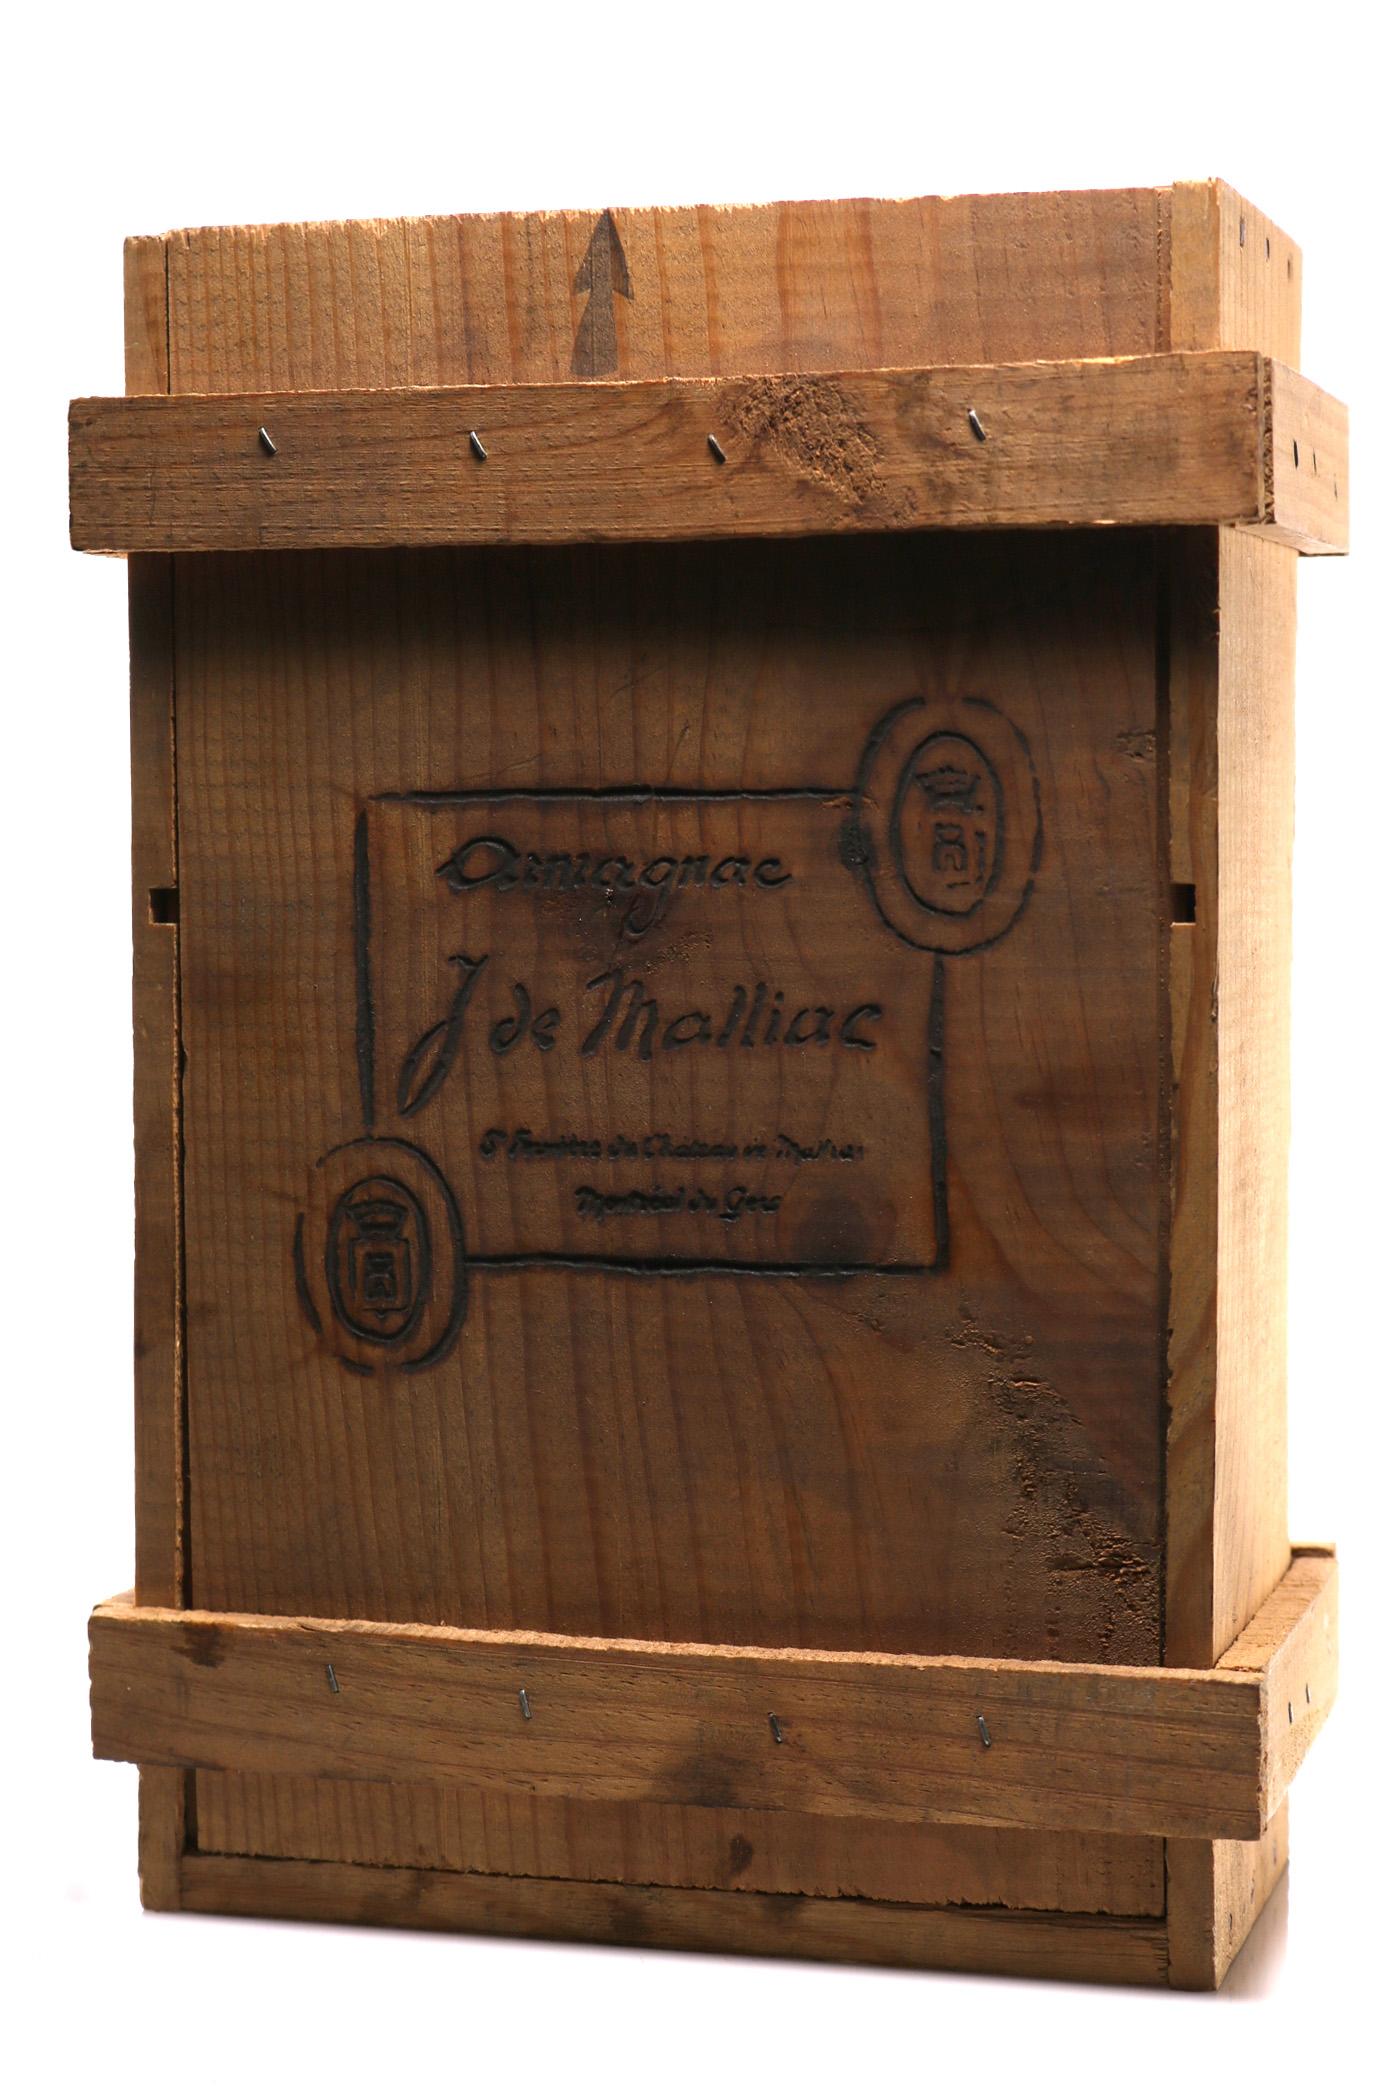 Armagnac 1933 Malliac